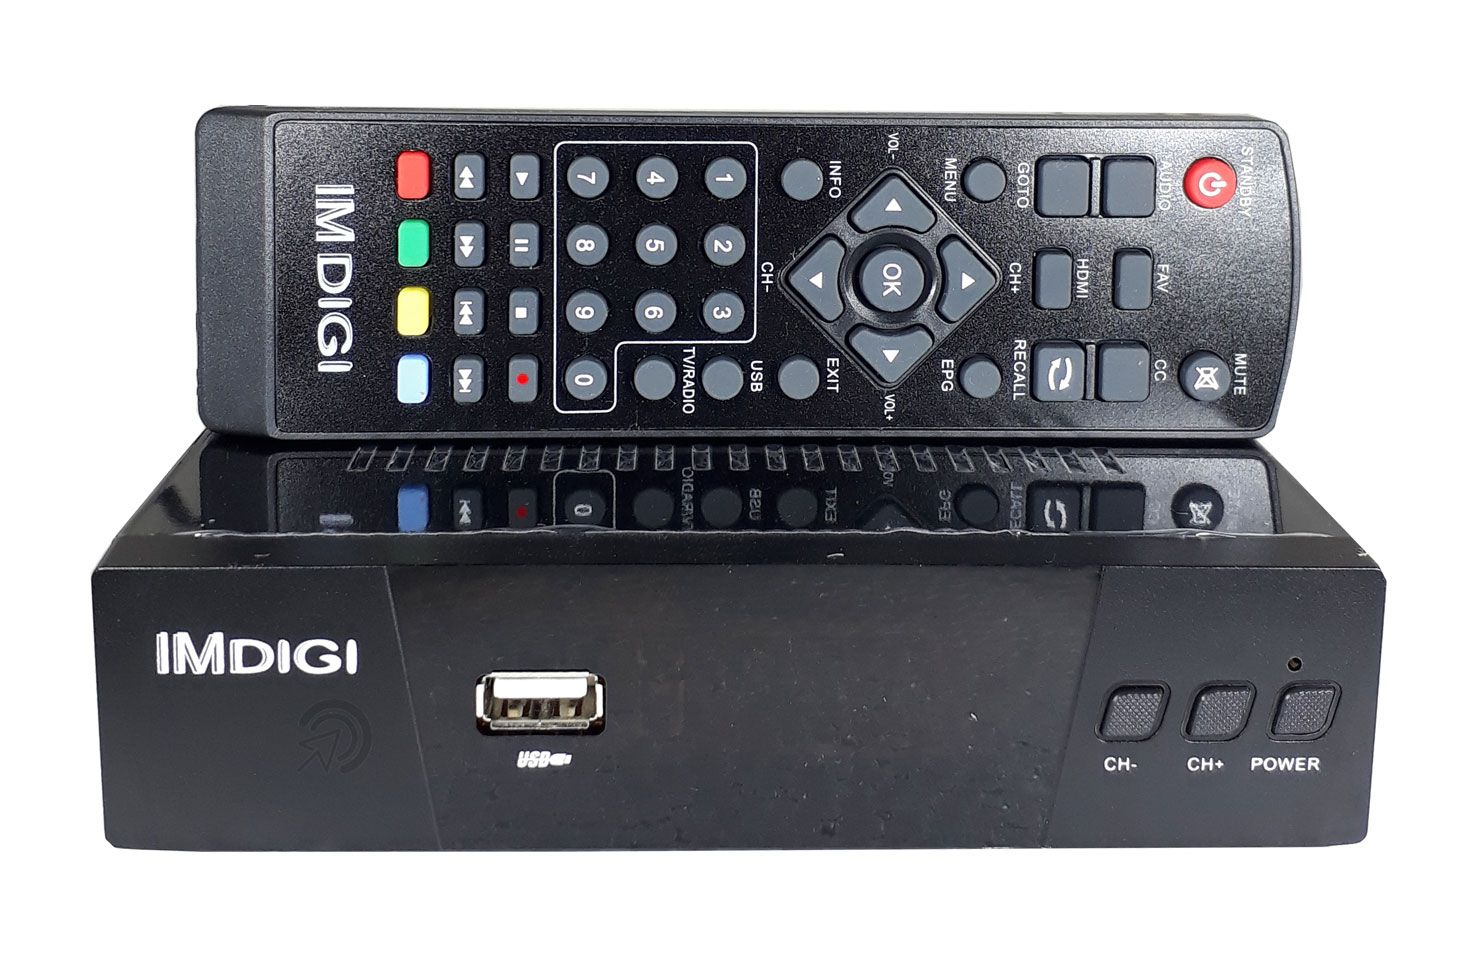 Kit Antena UHF Digital HDTV Externa + Conversor Digital HDTV USB com Gravador